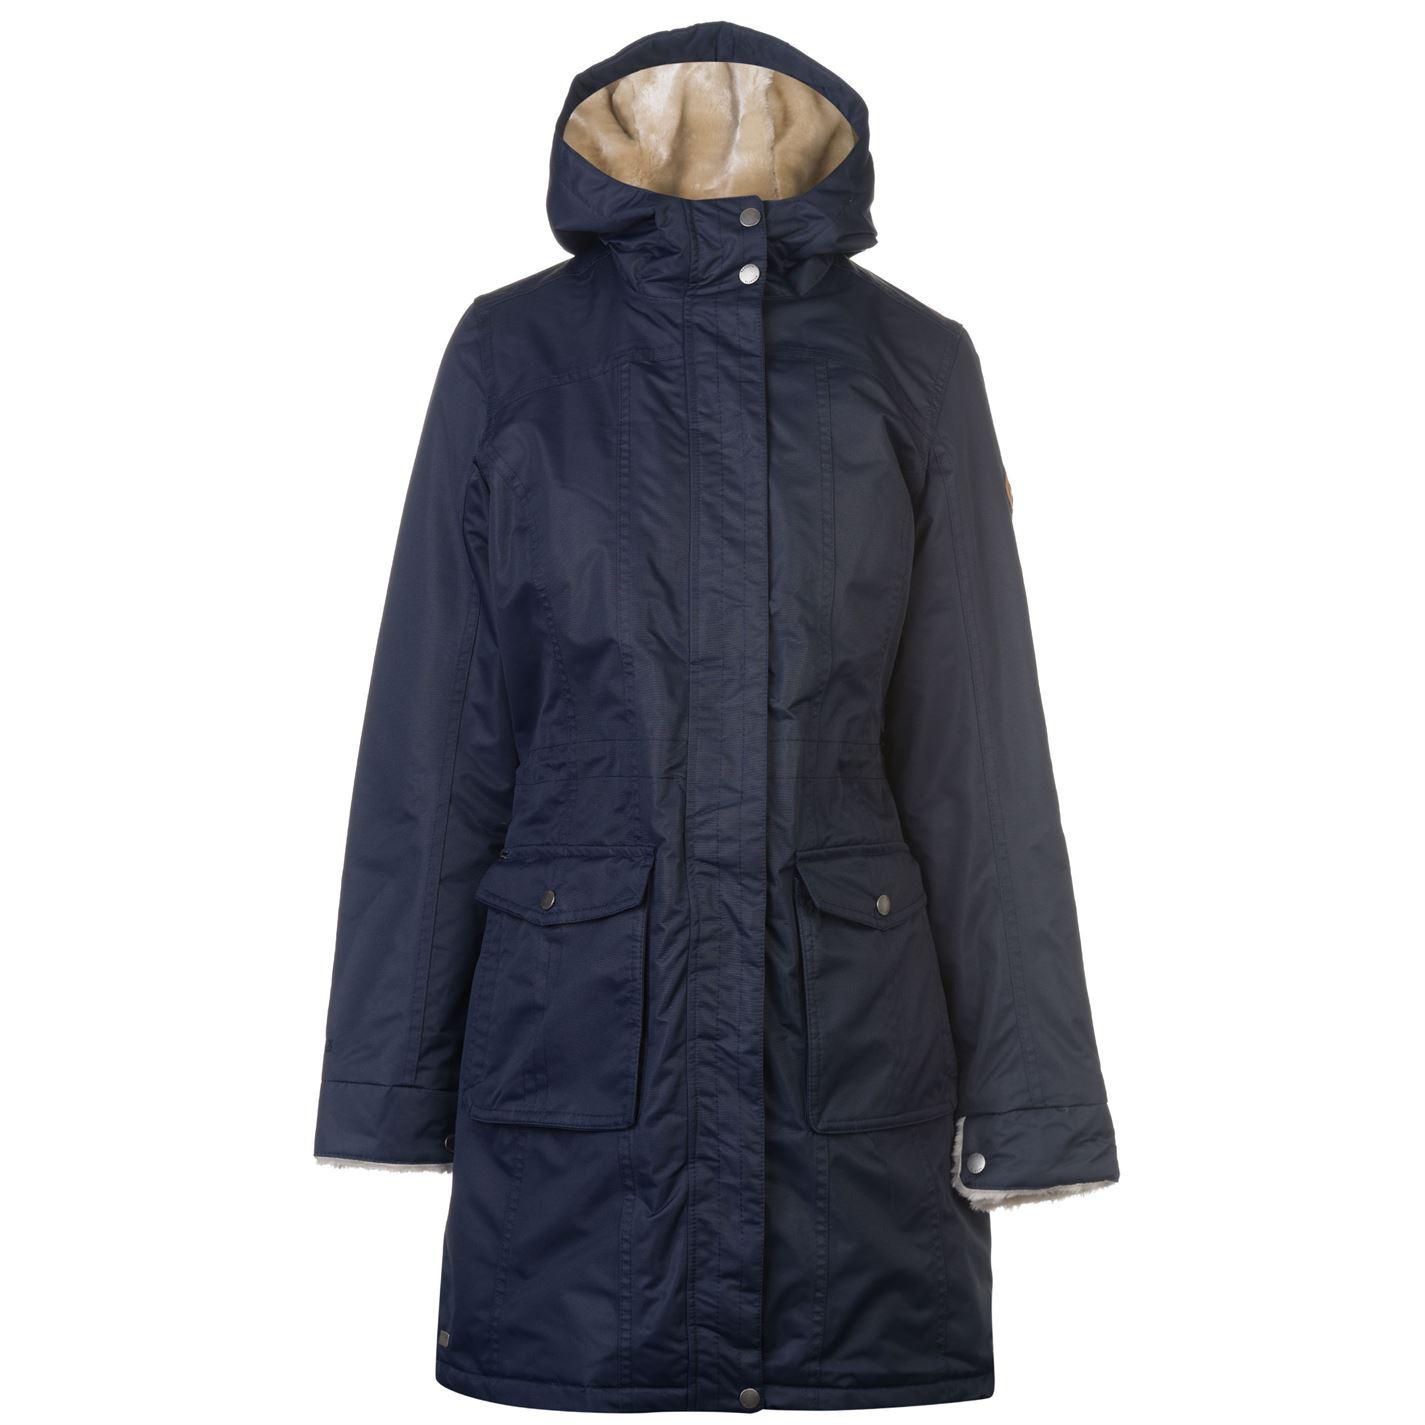 Insulated waterproof jacket womens